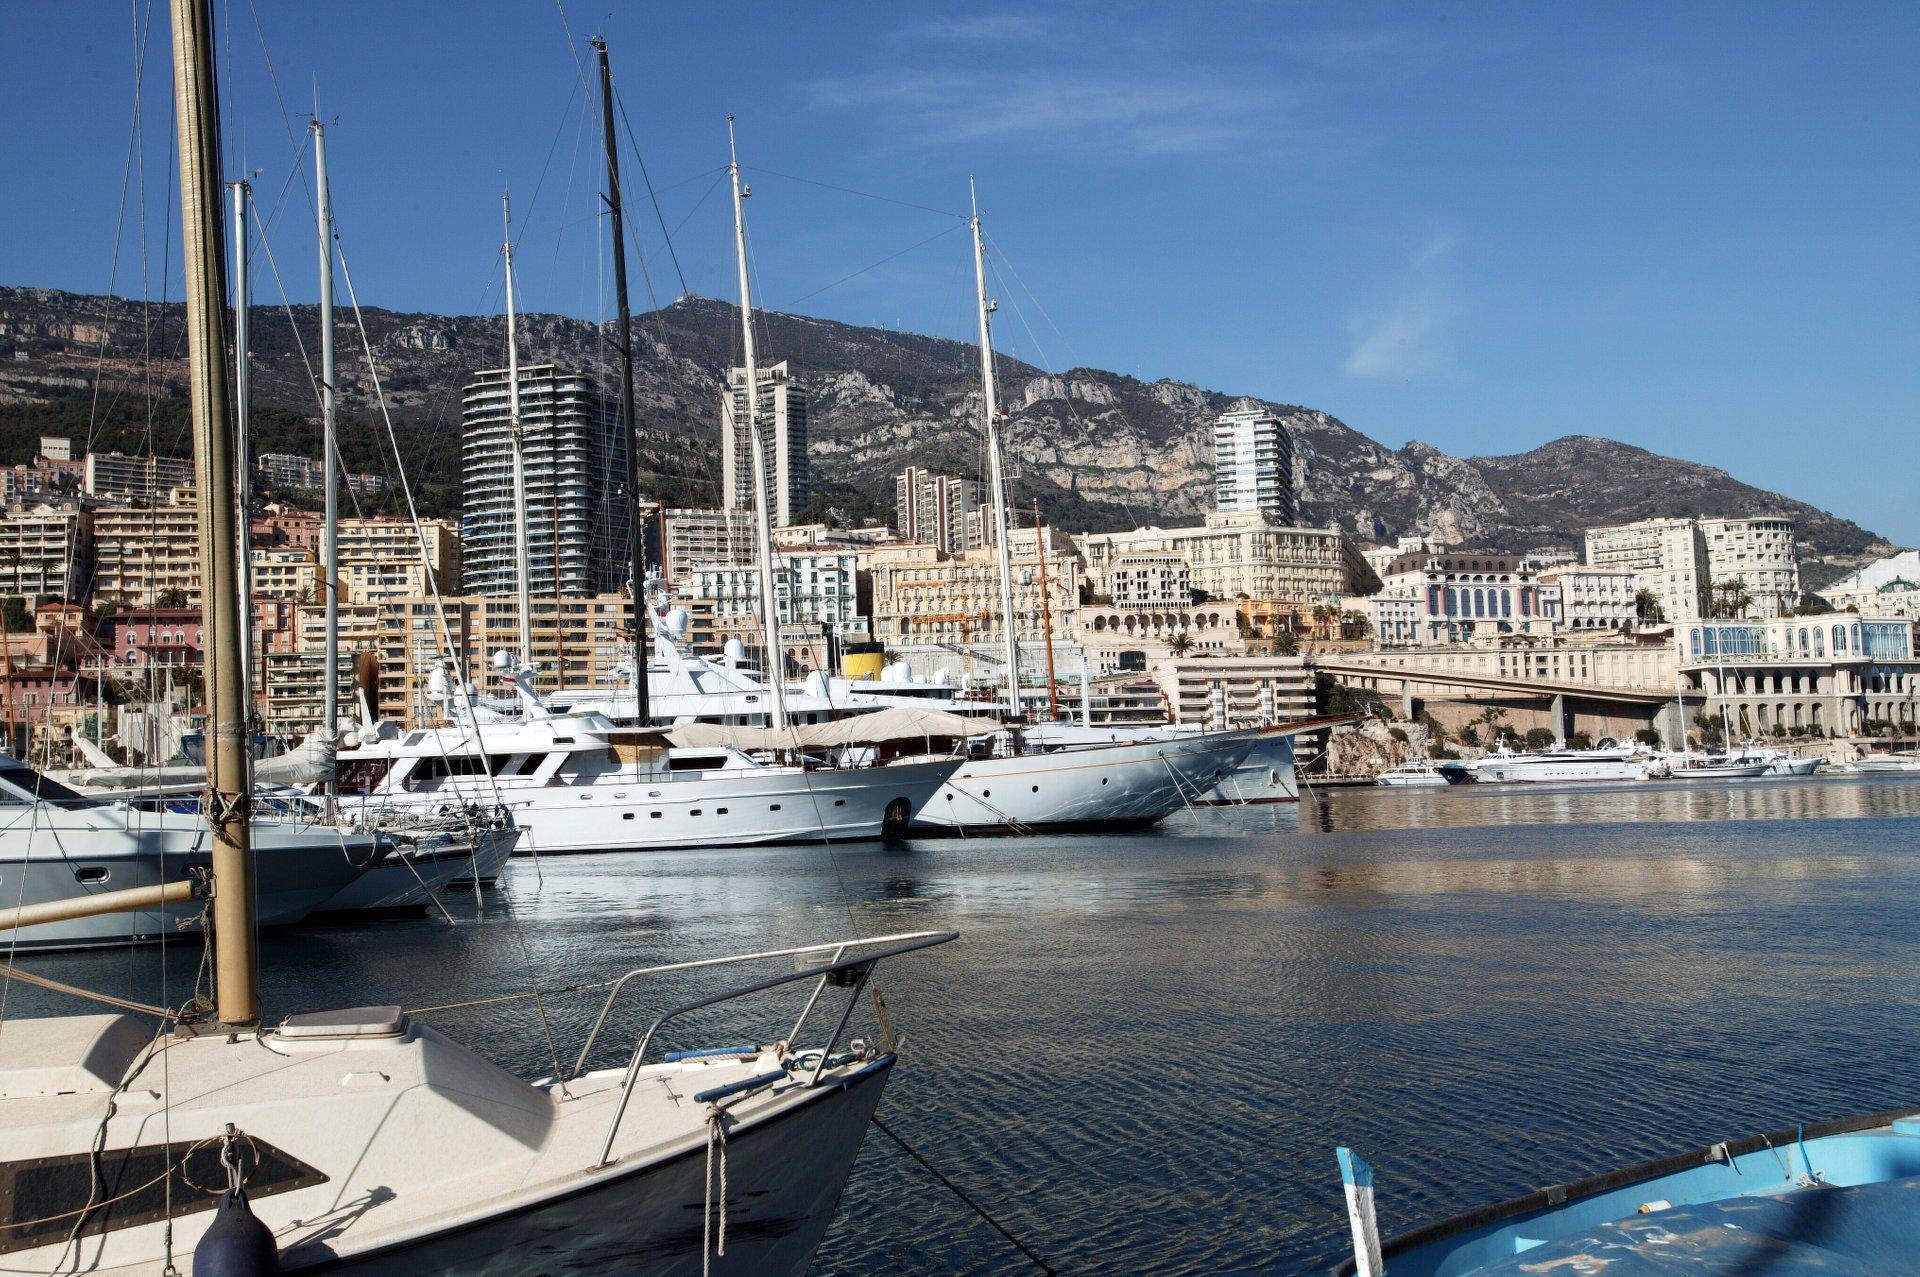 Sailing Season in Monaco 2020 - Best Time